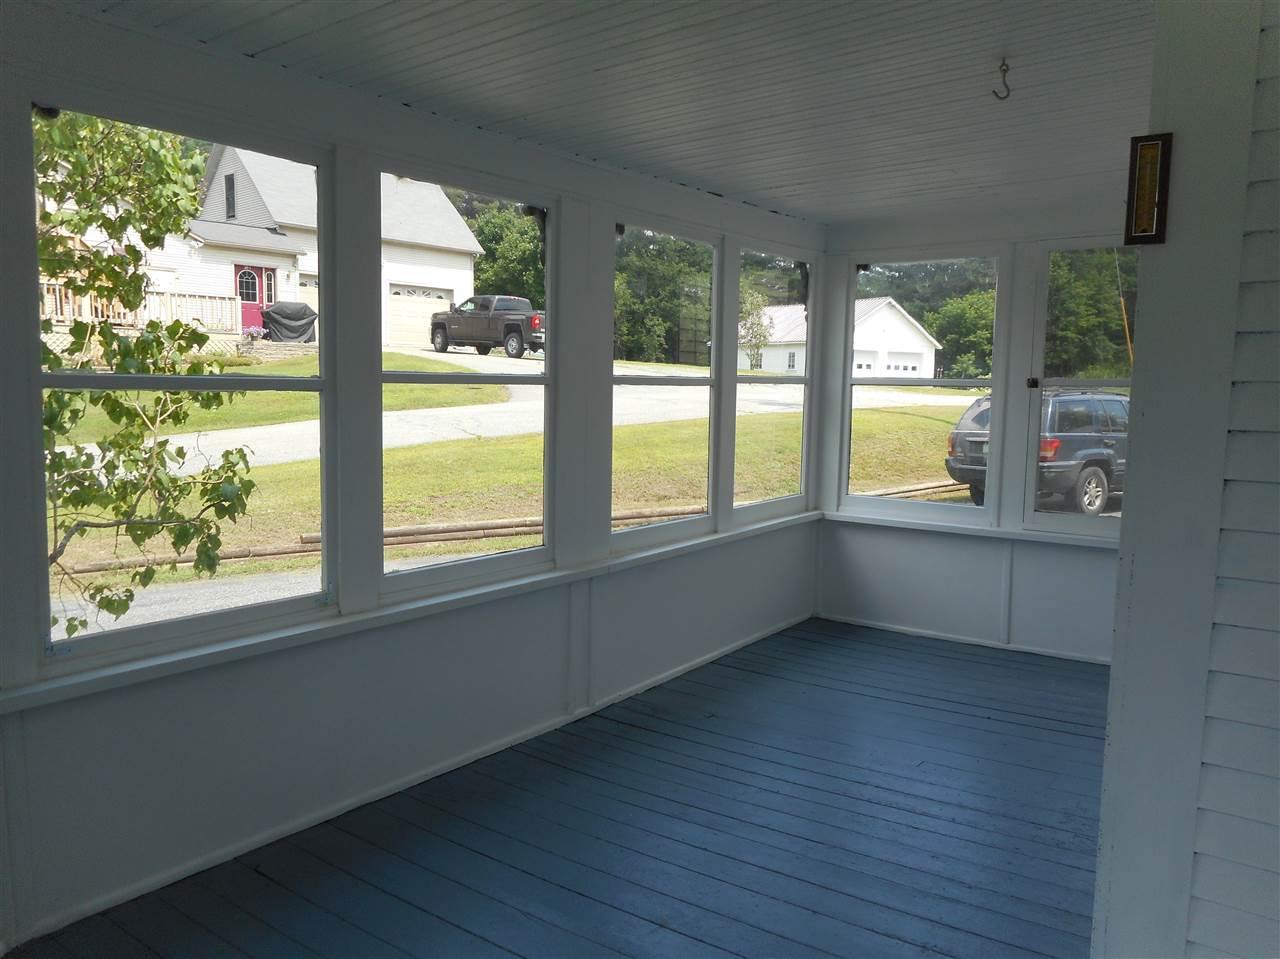 Vermont-Real-Estate-4651704-1